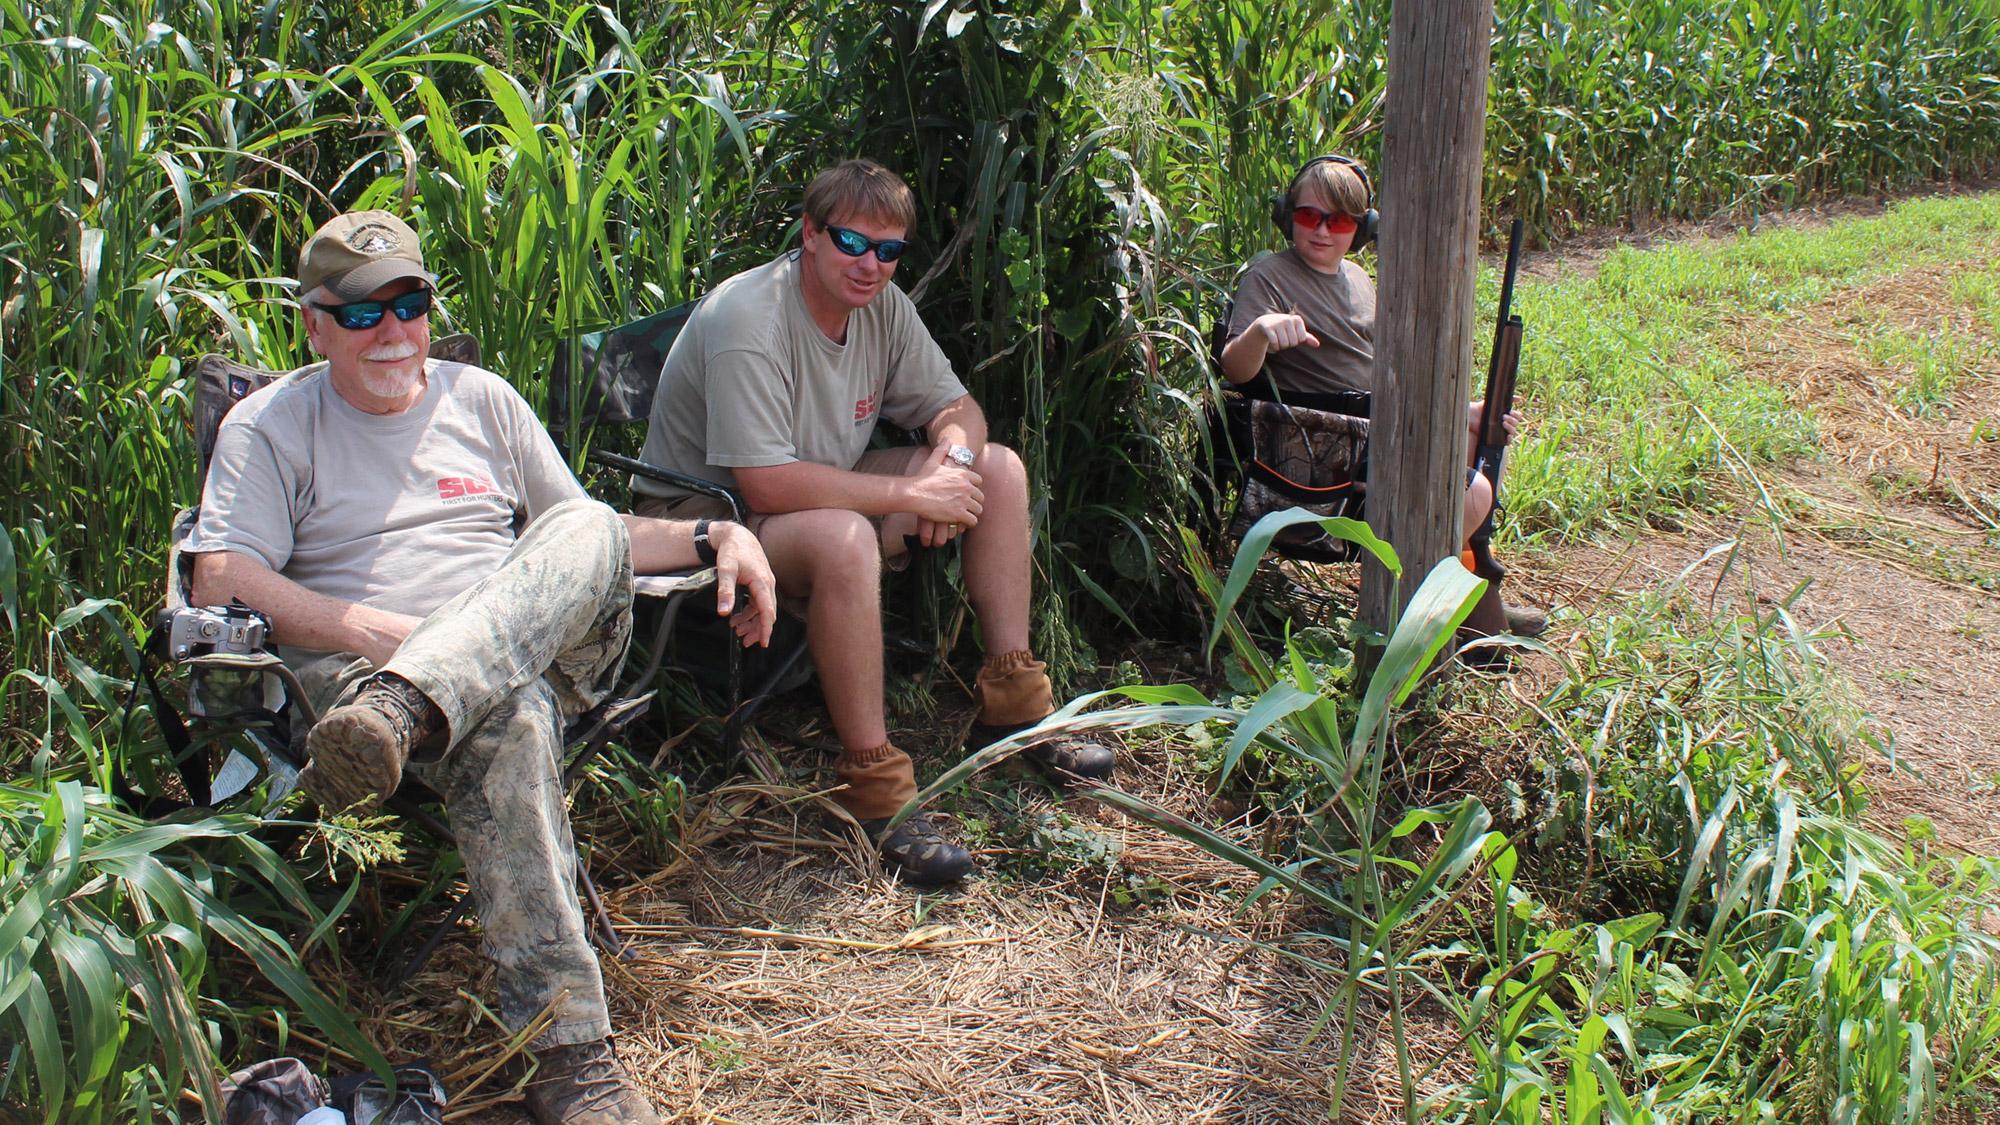 Bill Swan Wildlife Commissioner